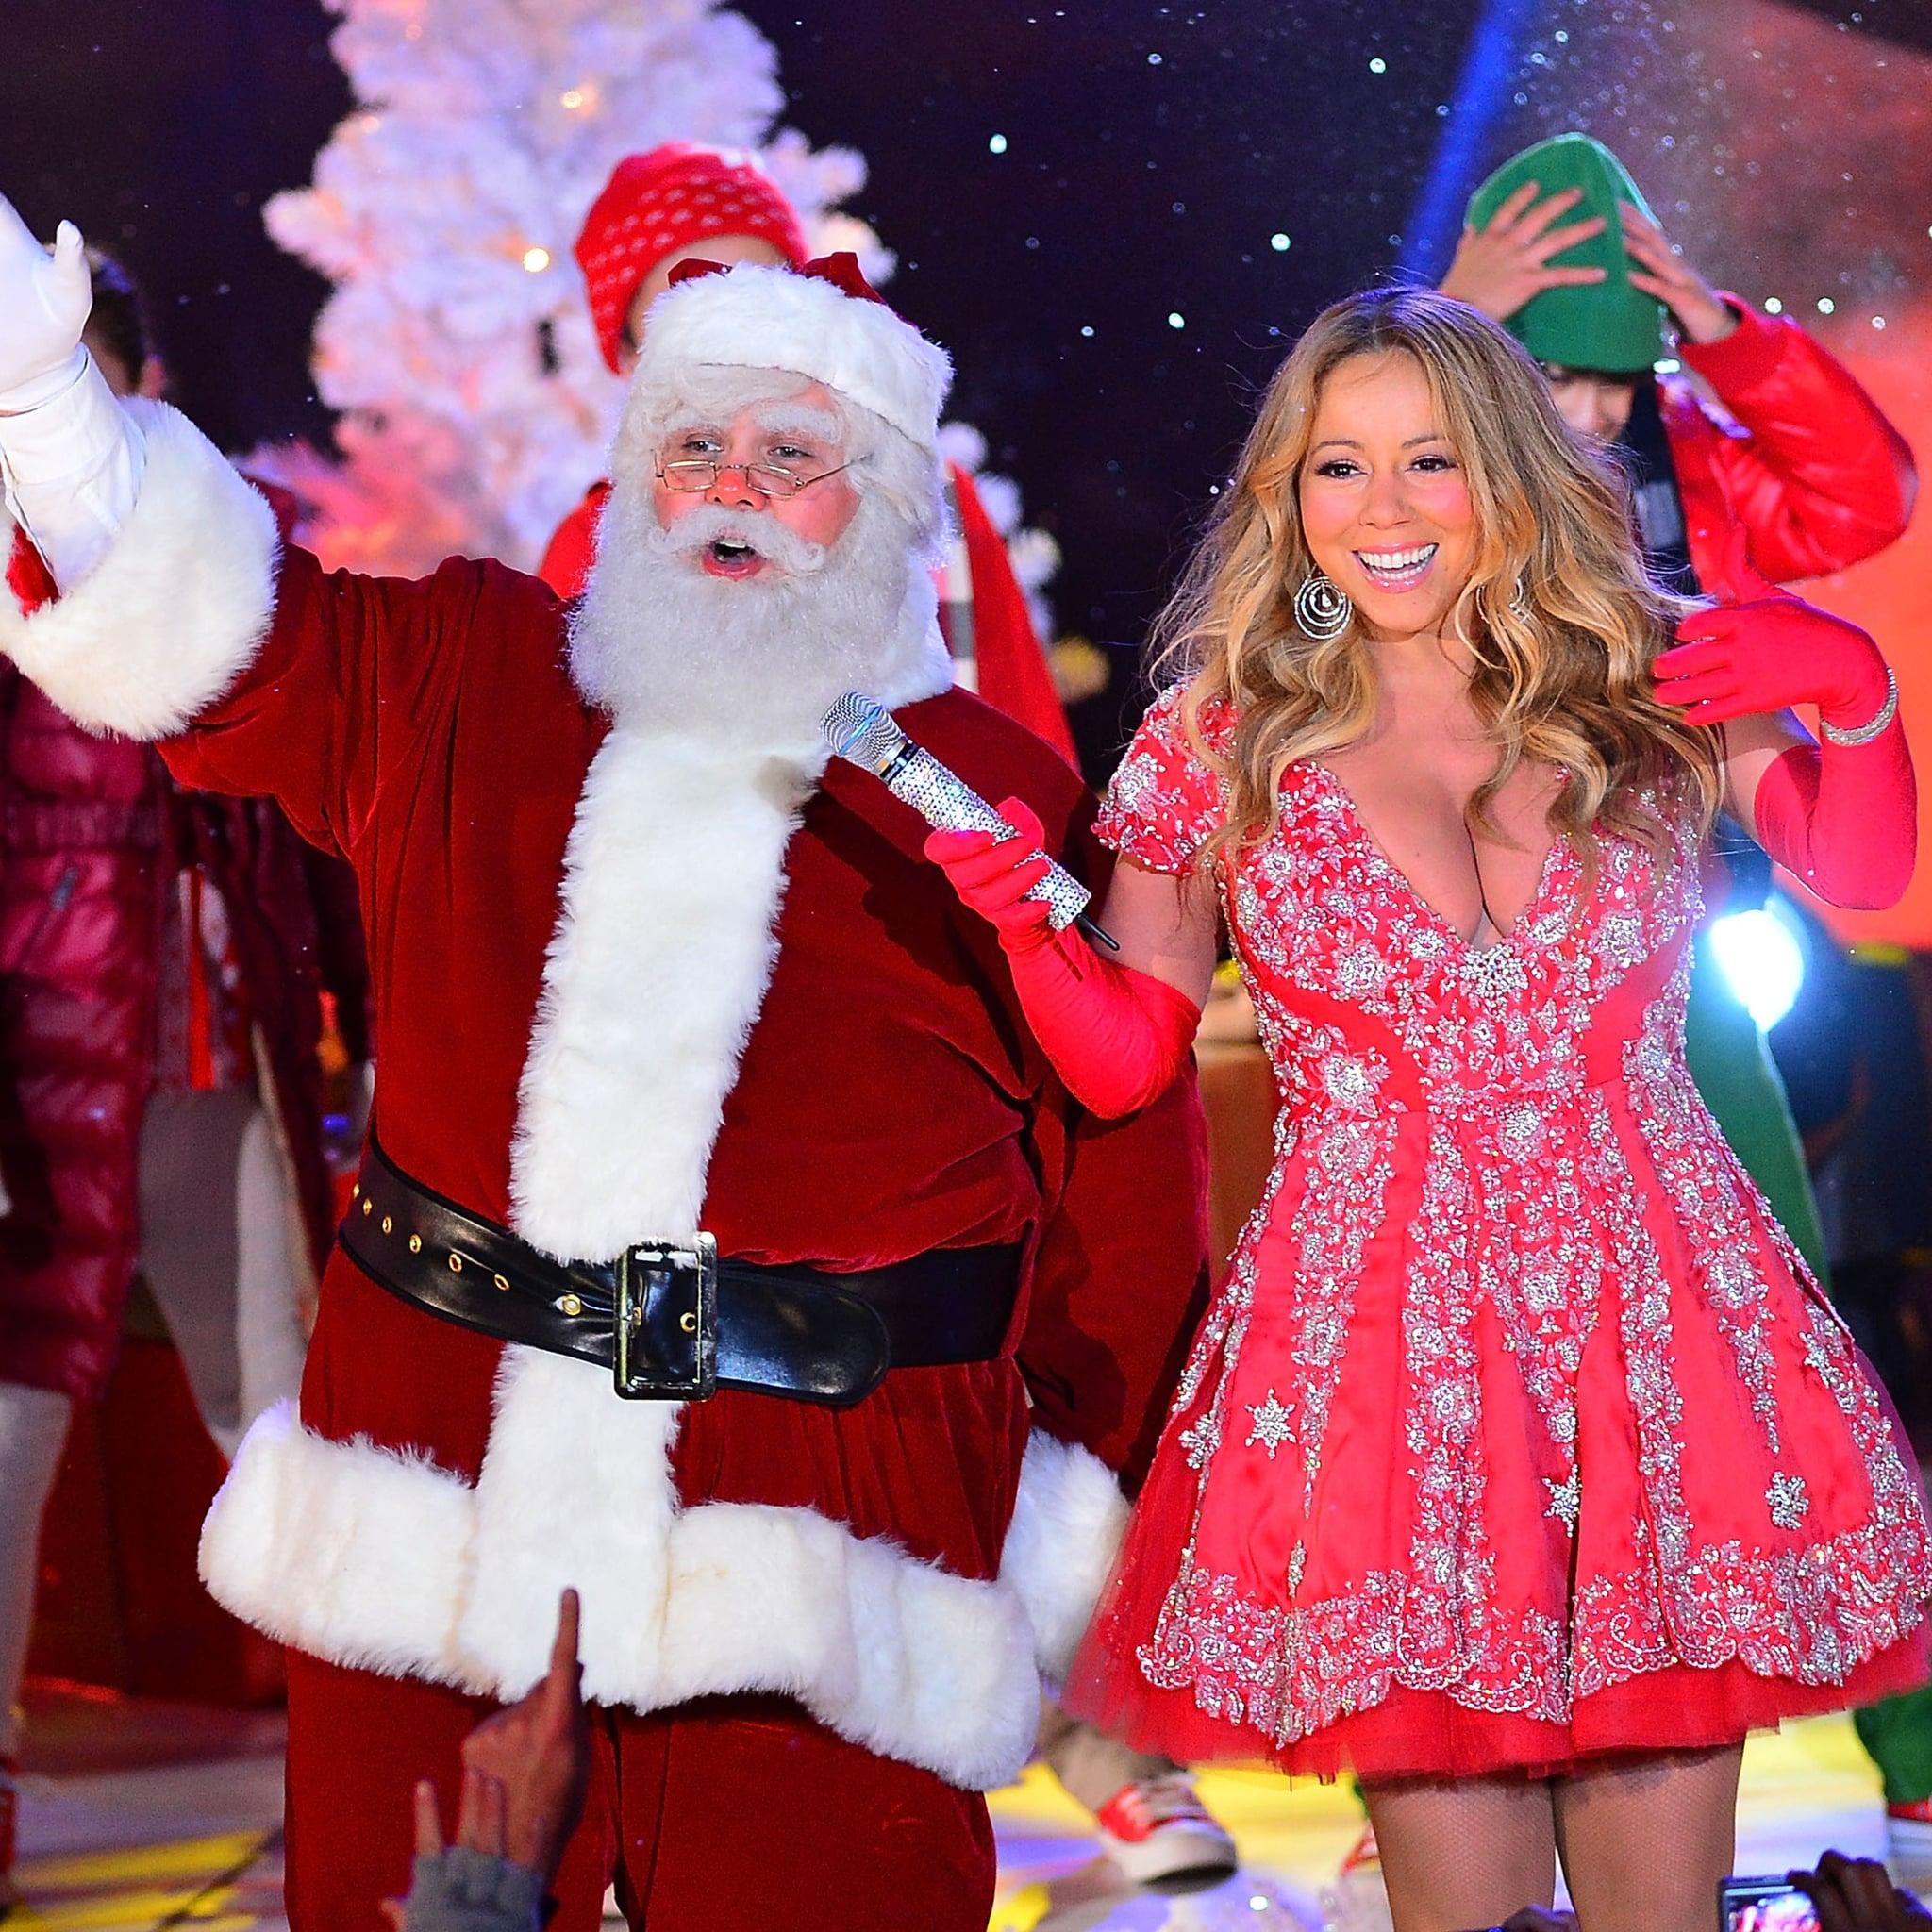 Youtube Christmas.Most Popular Christmas Songs On Youtube 2018 Popsugar